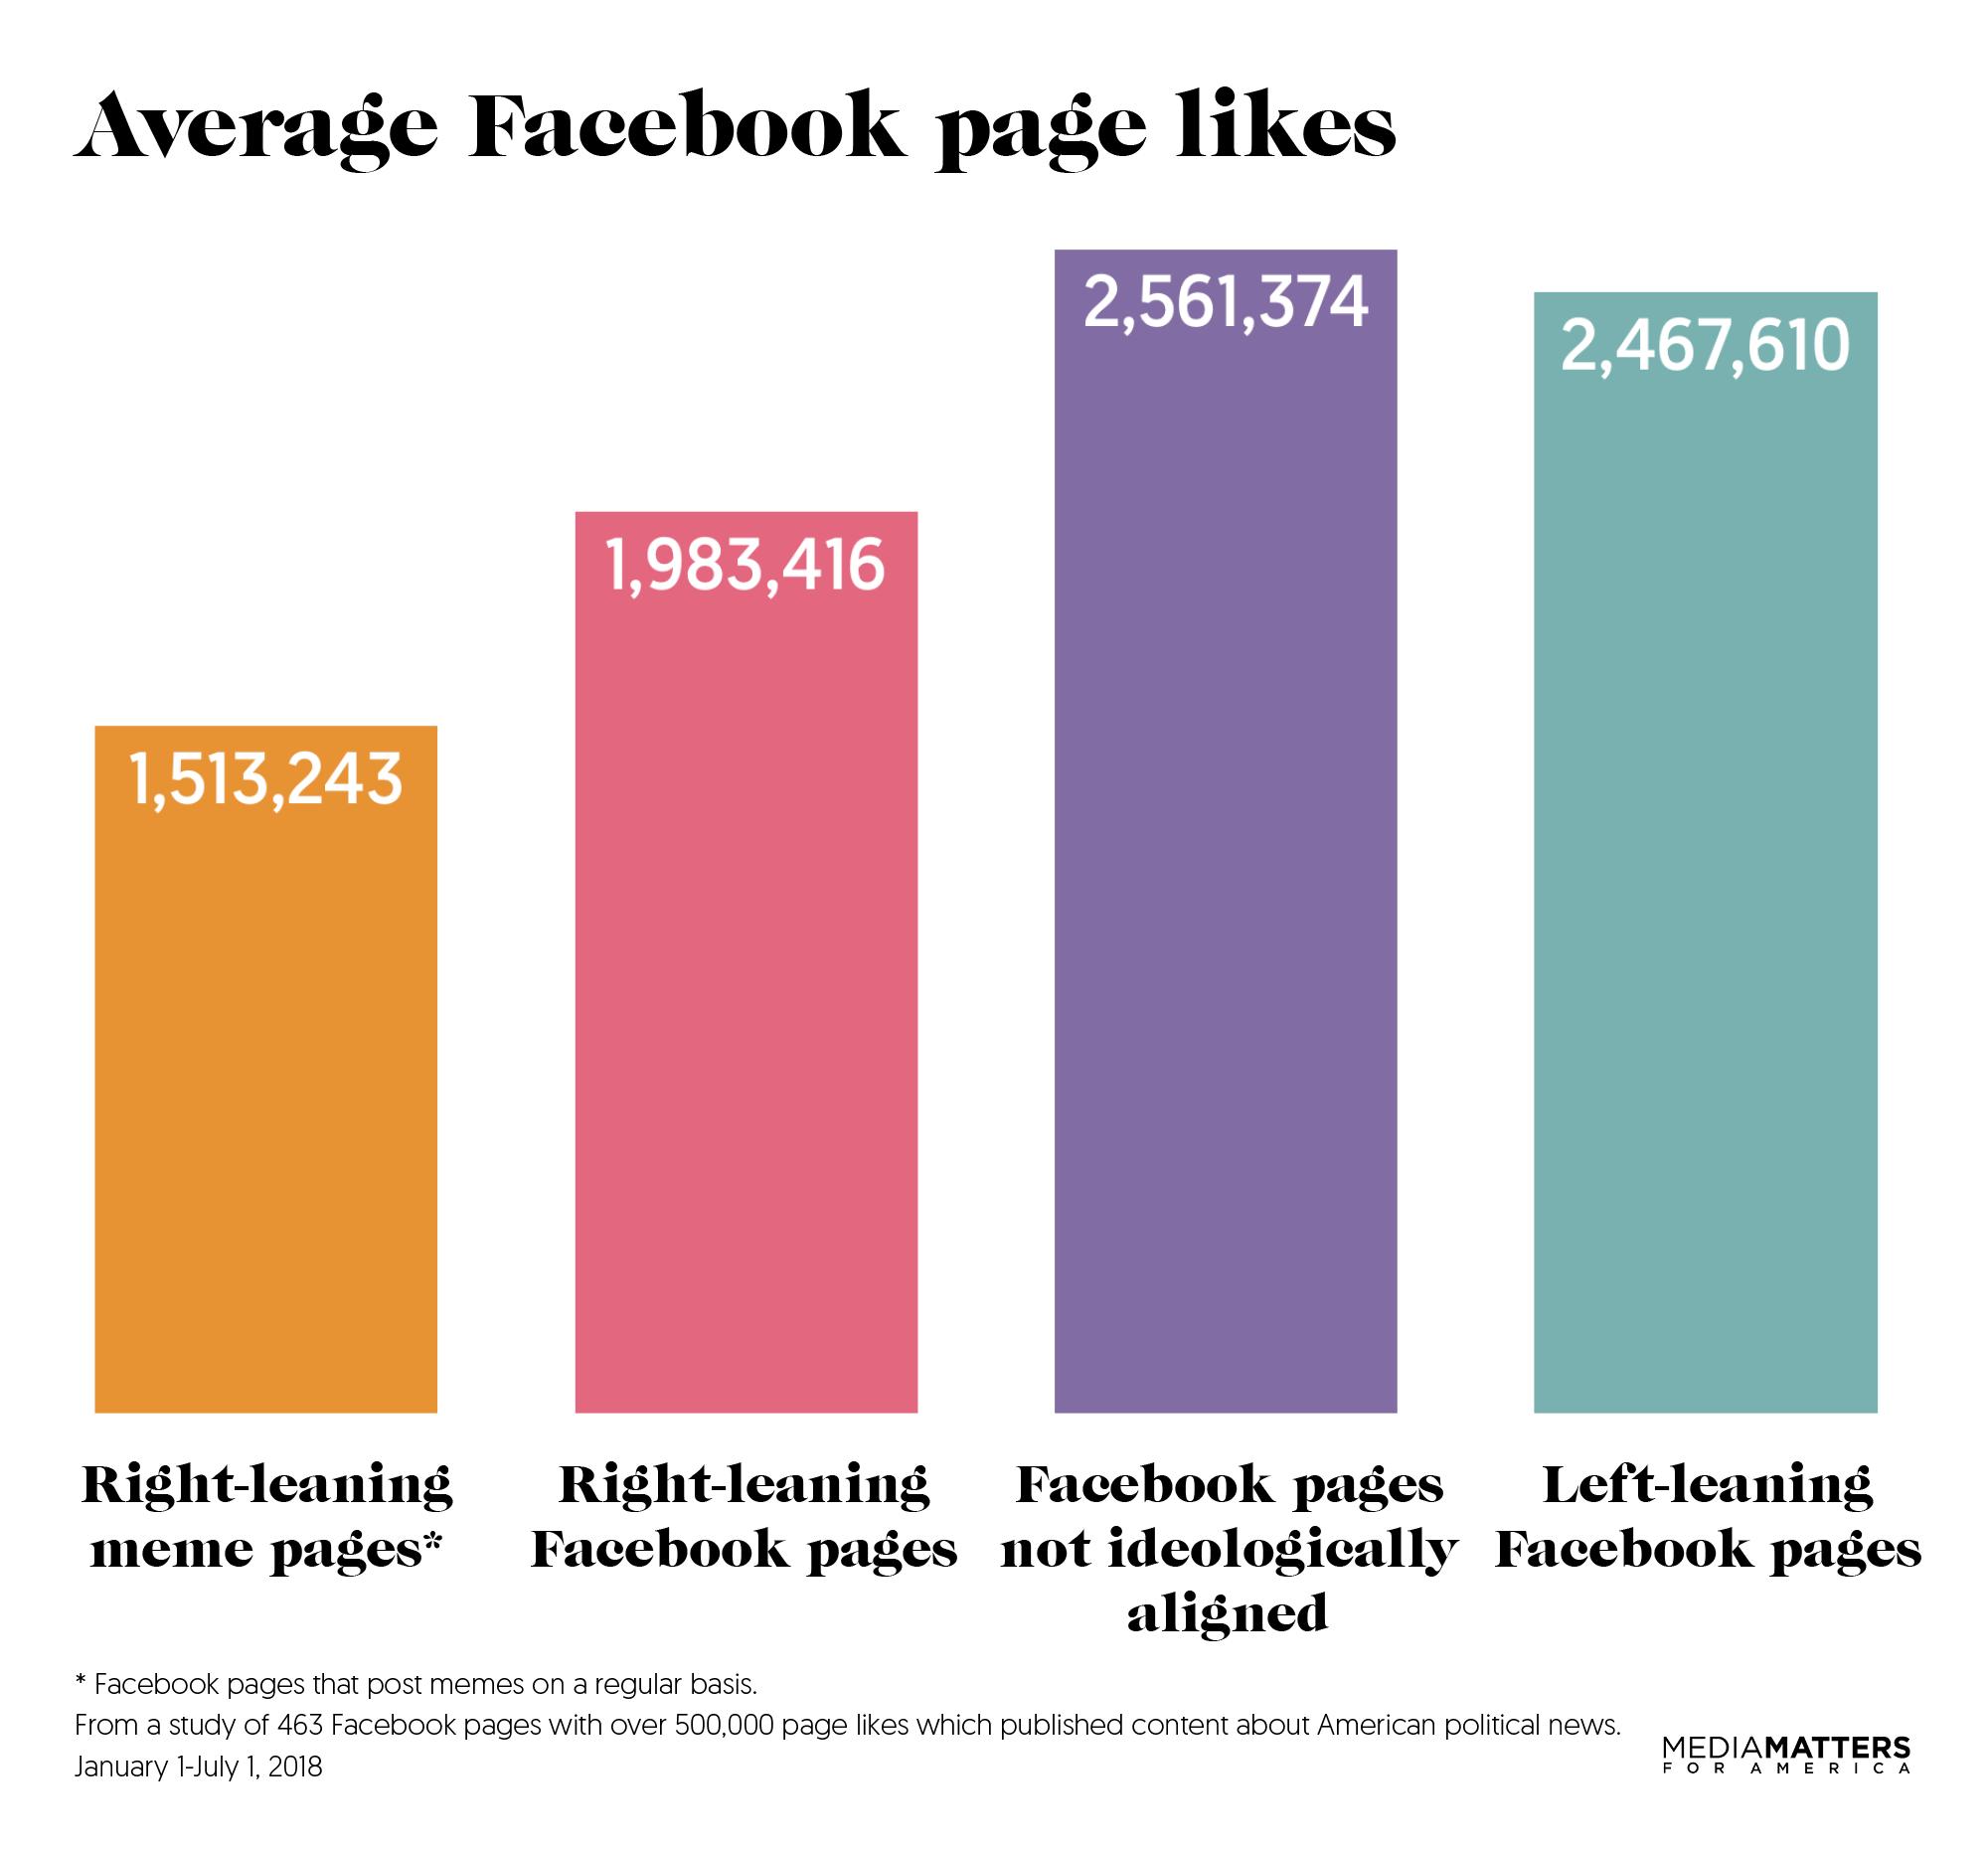 facebooklikes-mediamatters-graph2